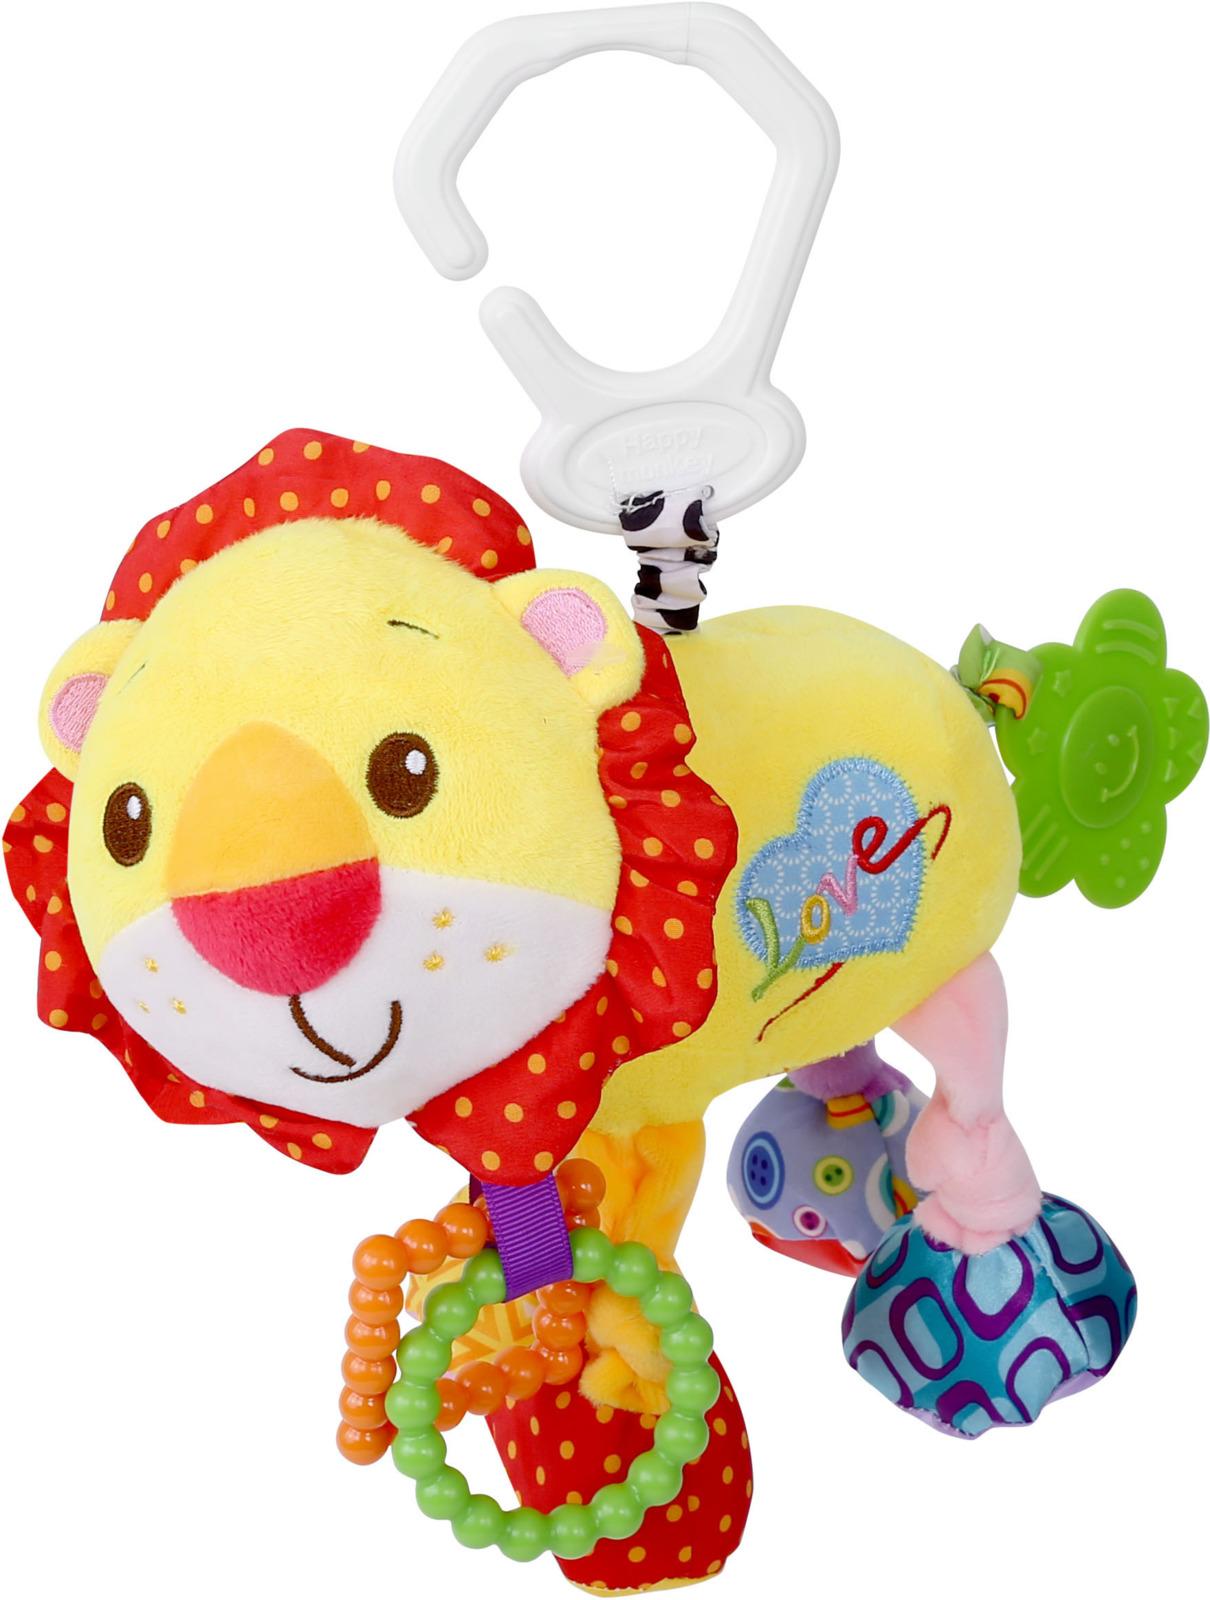 Развивающая игрушка Lorelli Toys Лев. 1019116 развивающая игрушка lorelli toys слоник 1019117